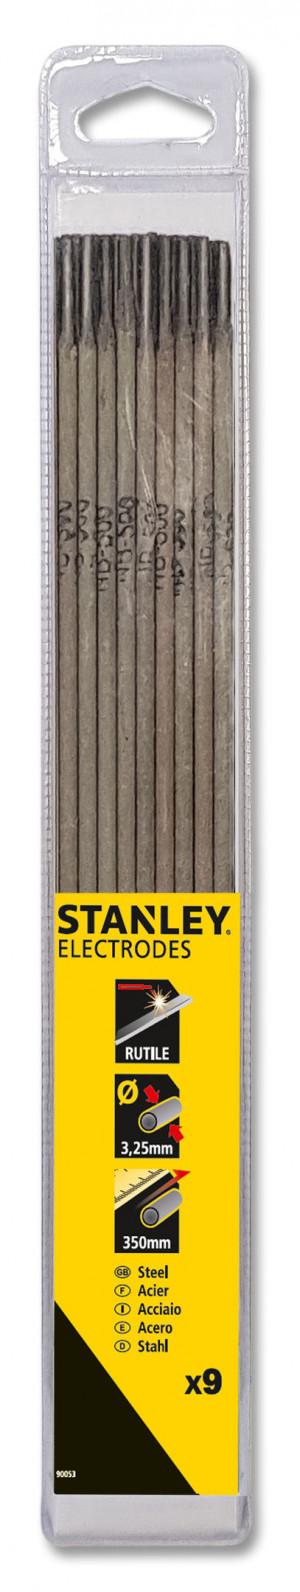 Stanley elektroder rutile 3,25 mm 9 stk.